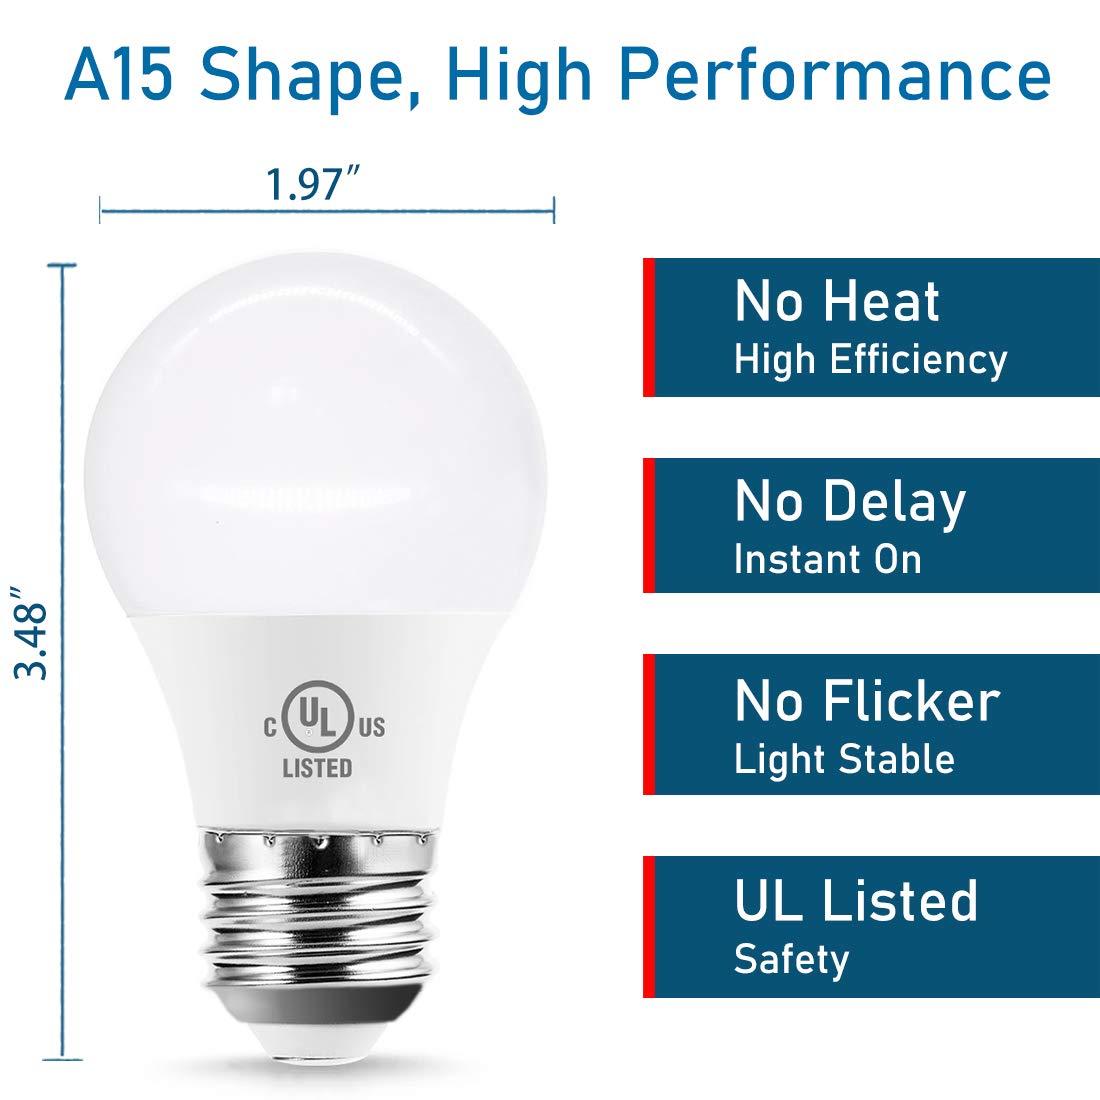 Small Size Bulb for Damp Location Waterproof 600 Lumen 7W 120V Daylight 5000K E26 Medium Base 2-Pack YUKIHALU Not-Dim LED Refrigerator Light Bulb 40W-60W Equivalent A15 Appliance Fridge Bulbs